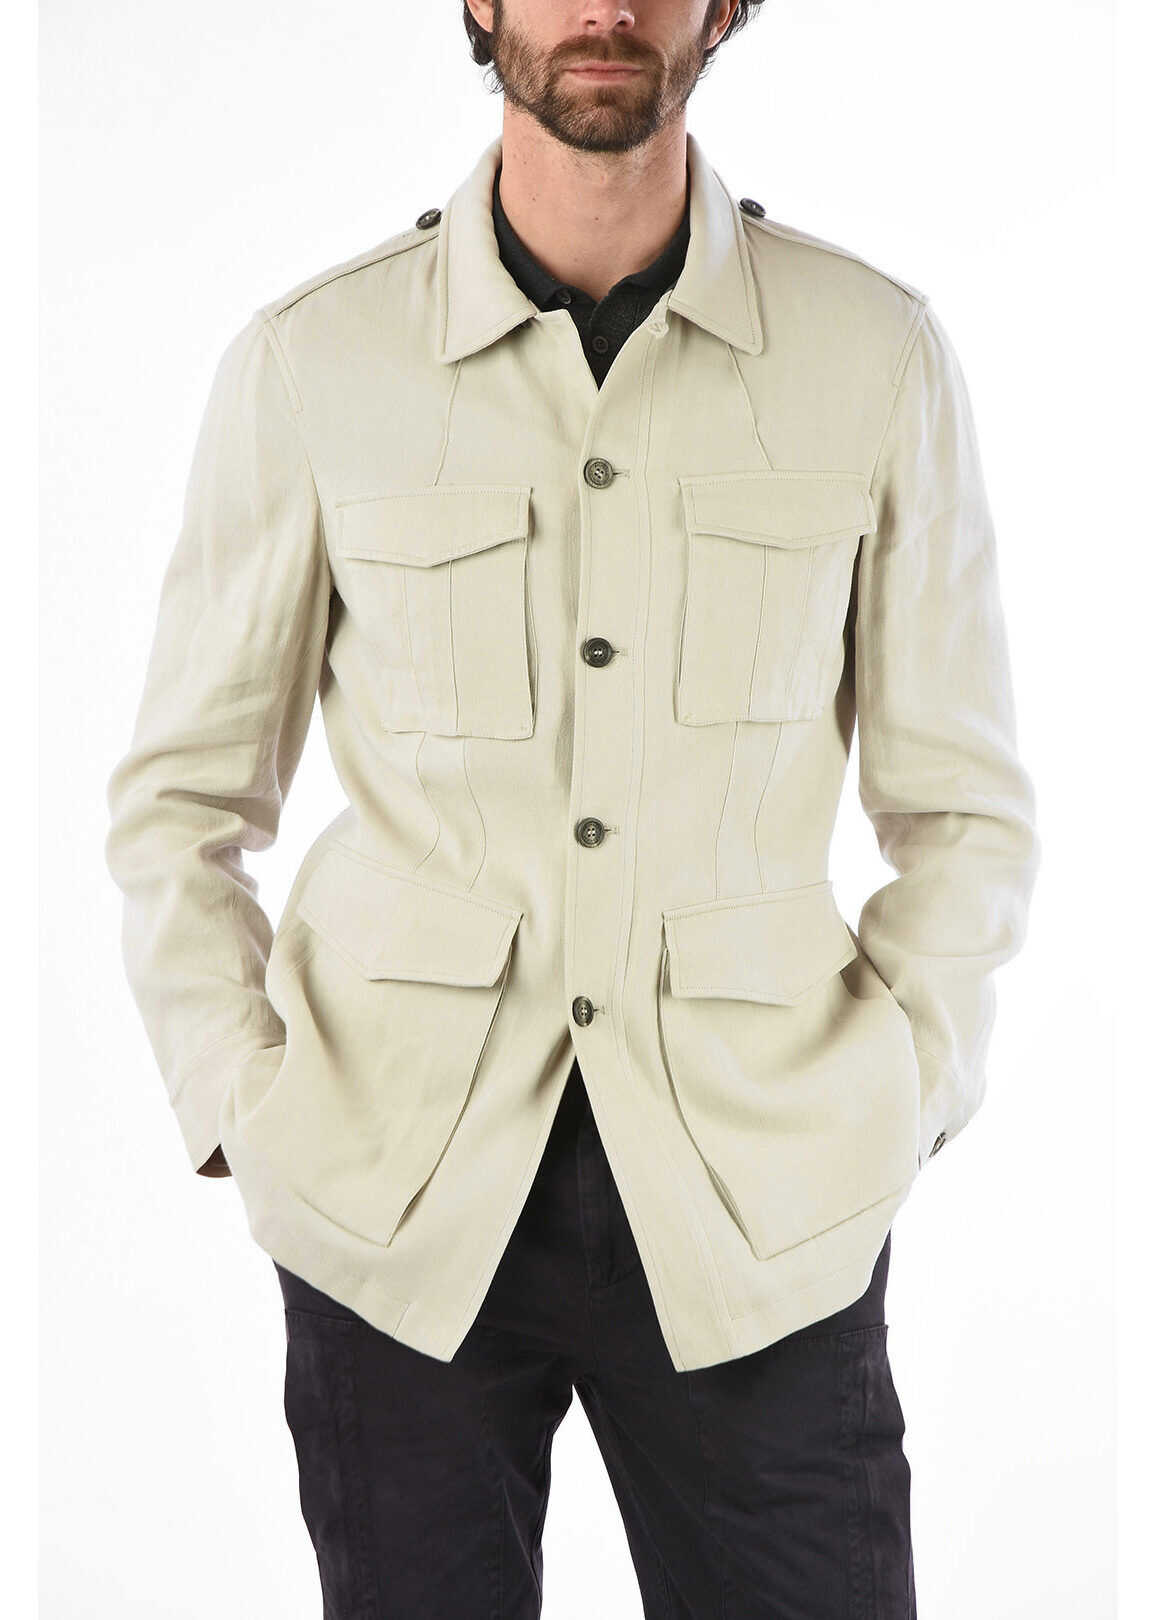 Brunello Cucinelli Multi-Pocket Jacket with Button Closure BEIGE imagine